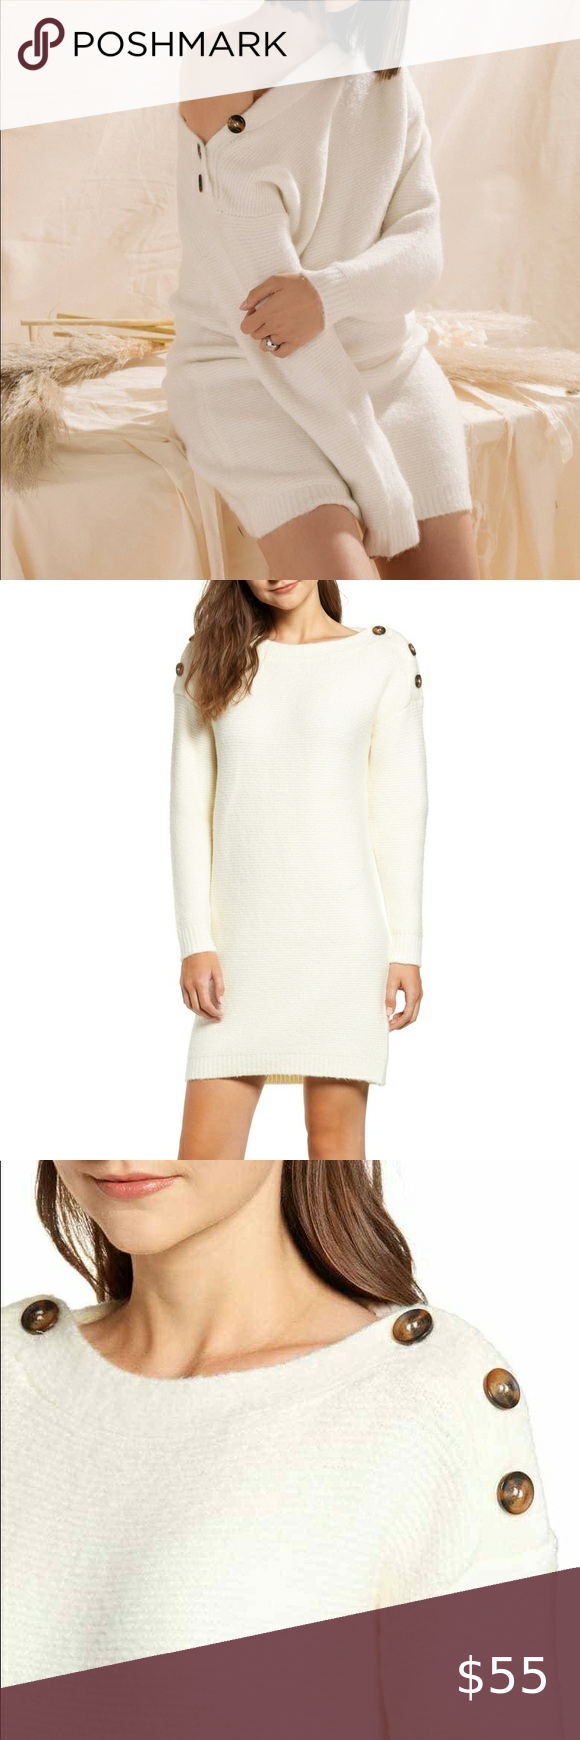 32+ Chriselle lim sawyer sweater dress trends